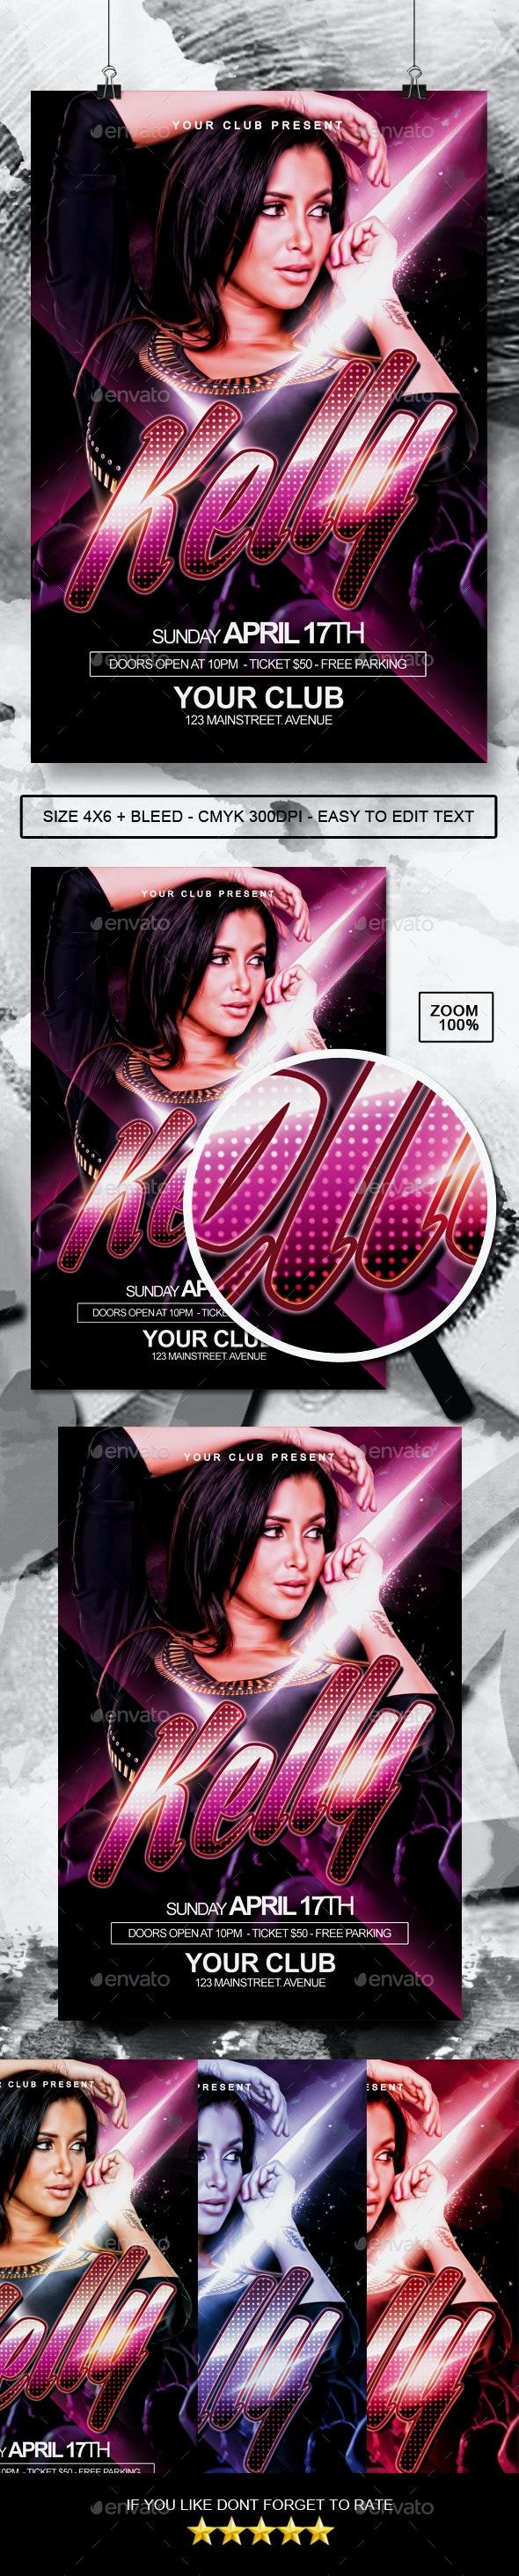 DJ Artist / Concert Flyer - Clubs & Parties Events